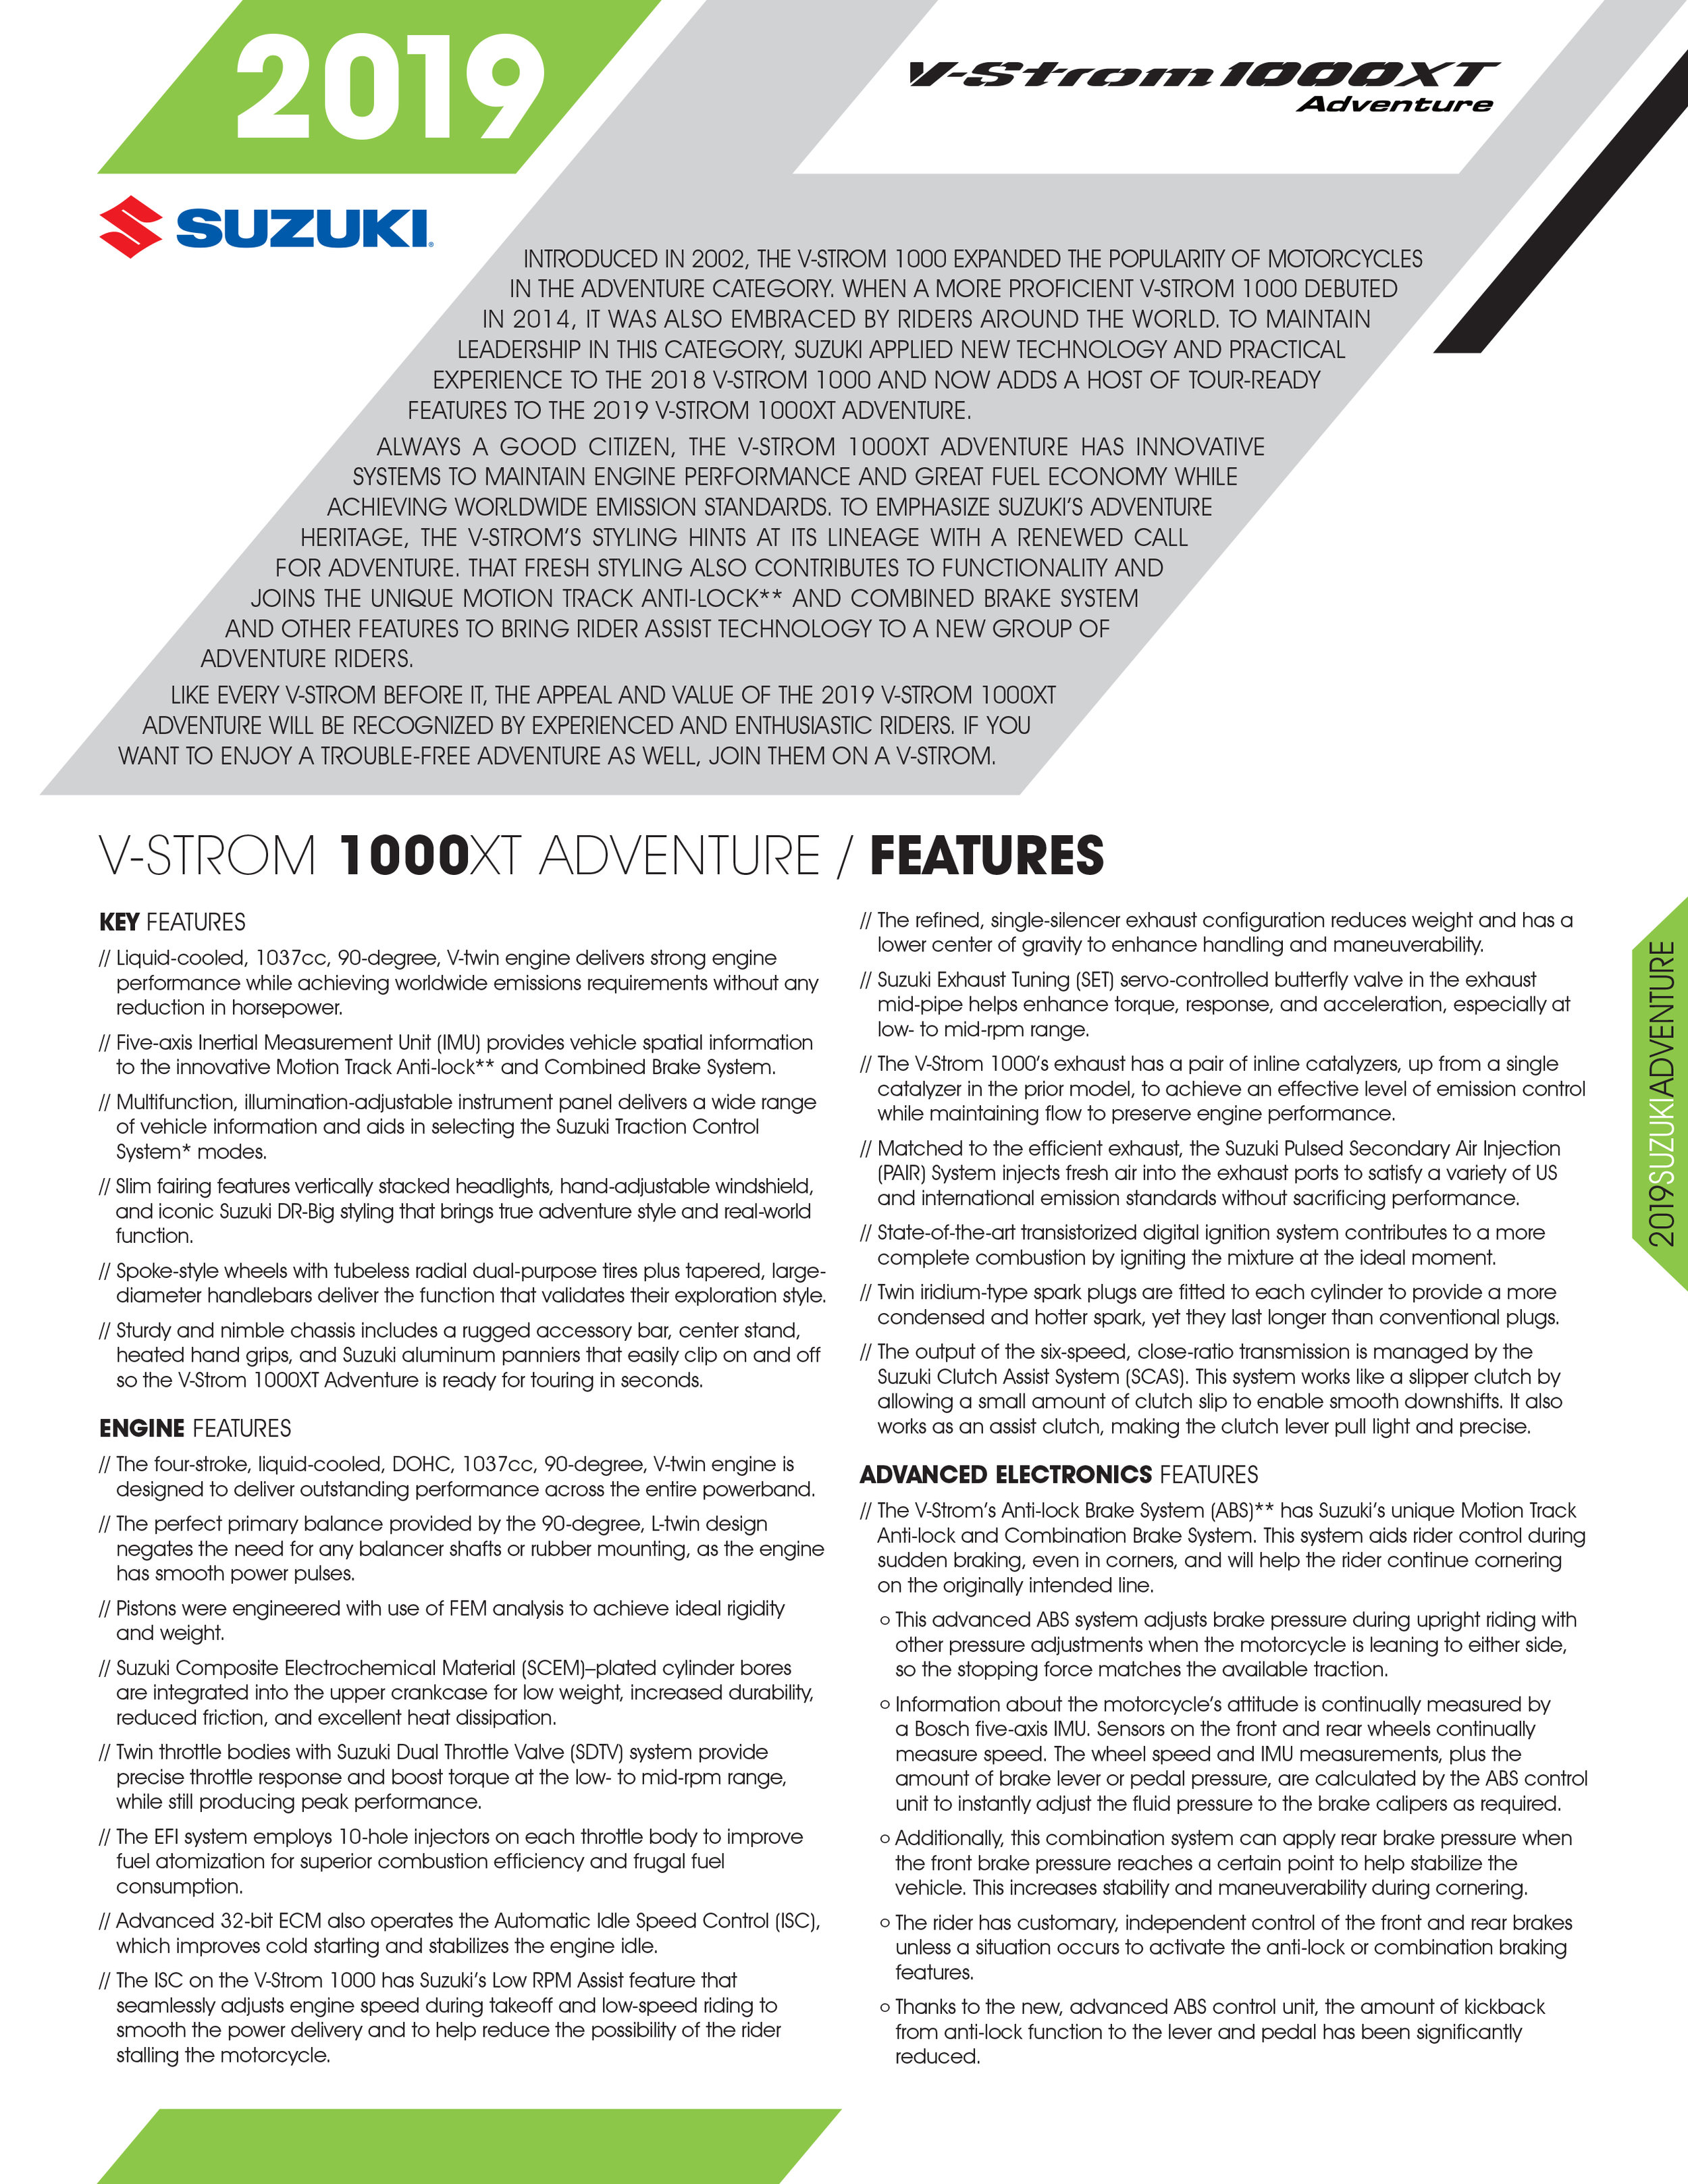 SUZ-1009_Adventure_V-Strom_1000XT_Adventure_OS_Hi_F-2.jpg